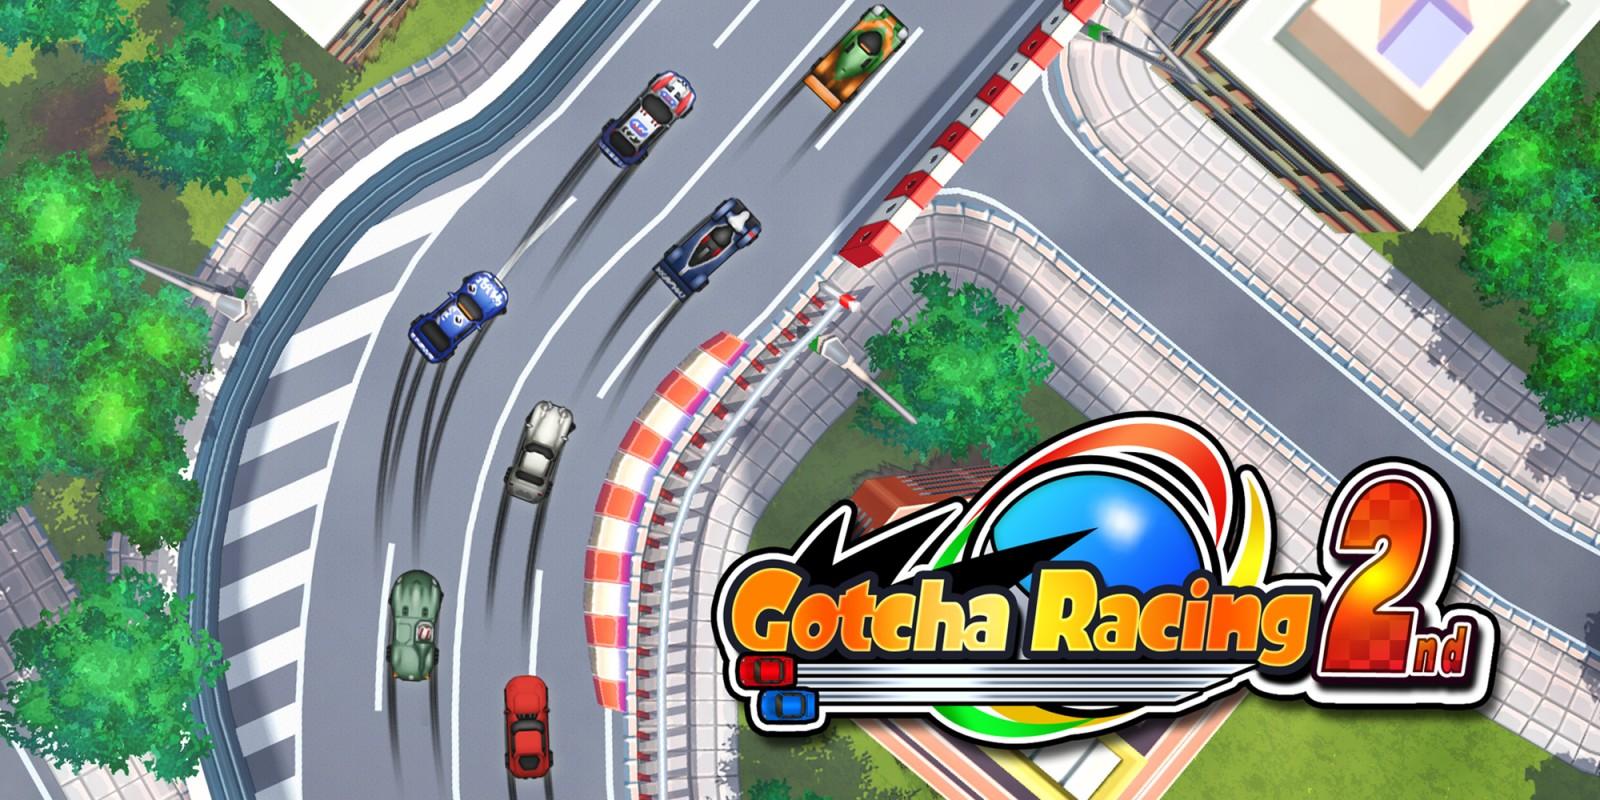 Gotcha Racing 2nd | Nintendo Switch download software | Games | Nintendo